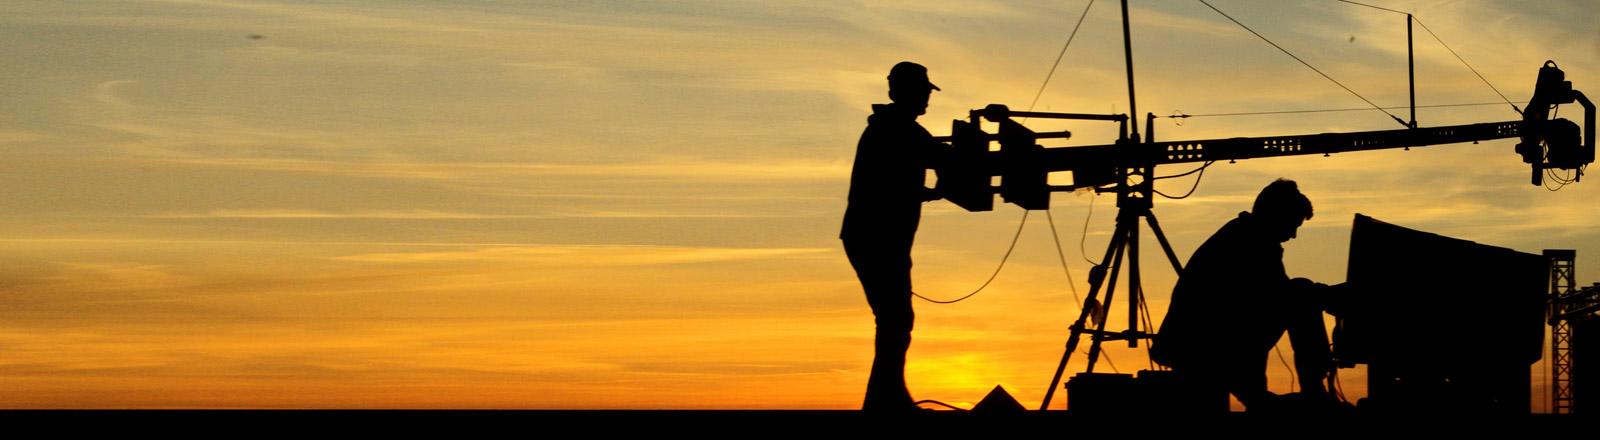 Zwei Kameraleute bedienen einen Kamerakran